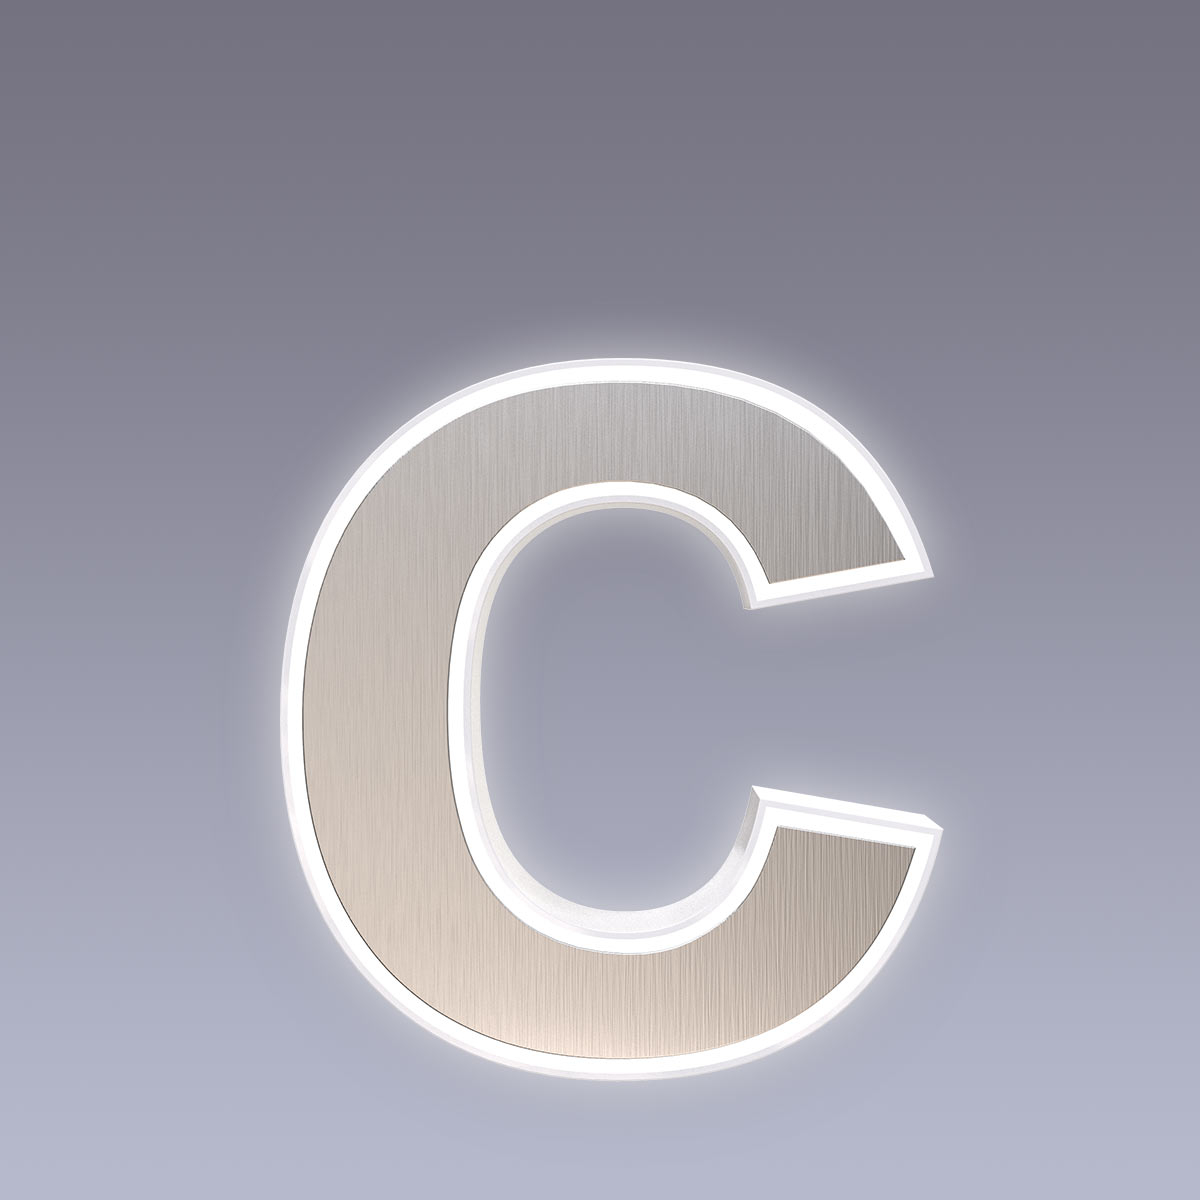 Cover für 15cm Hausnummer c Edelstahl Arial selbstklebend